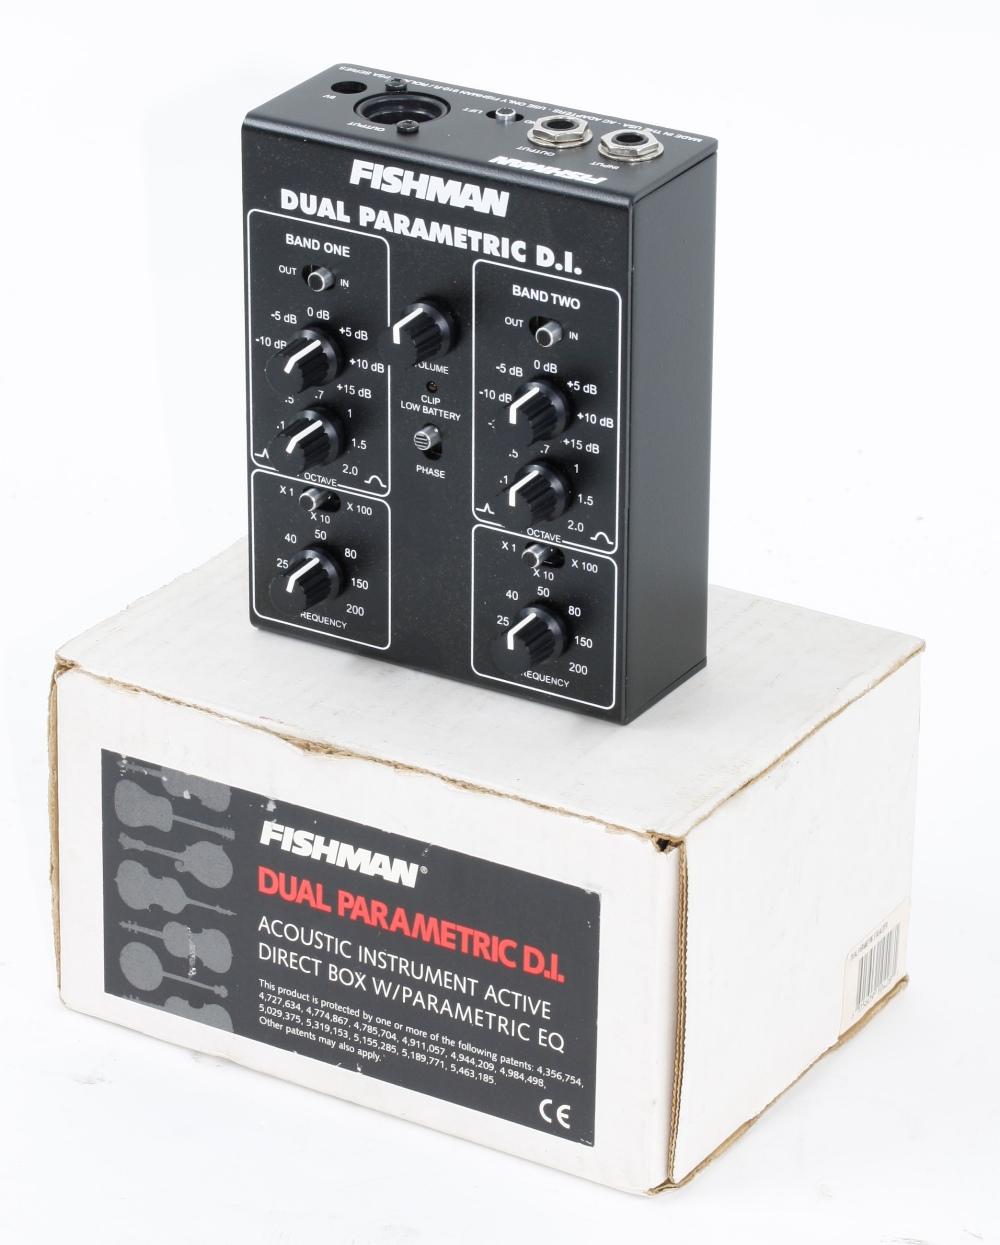 Fishman Dual Parametric DI acoustic instrument box, boxed